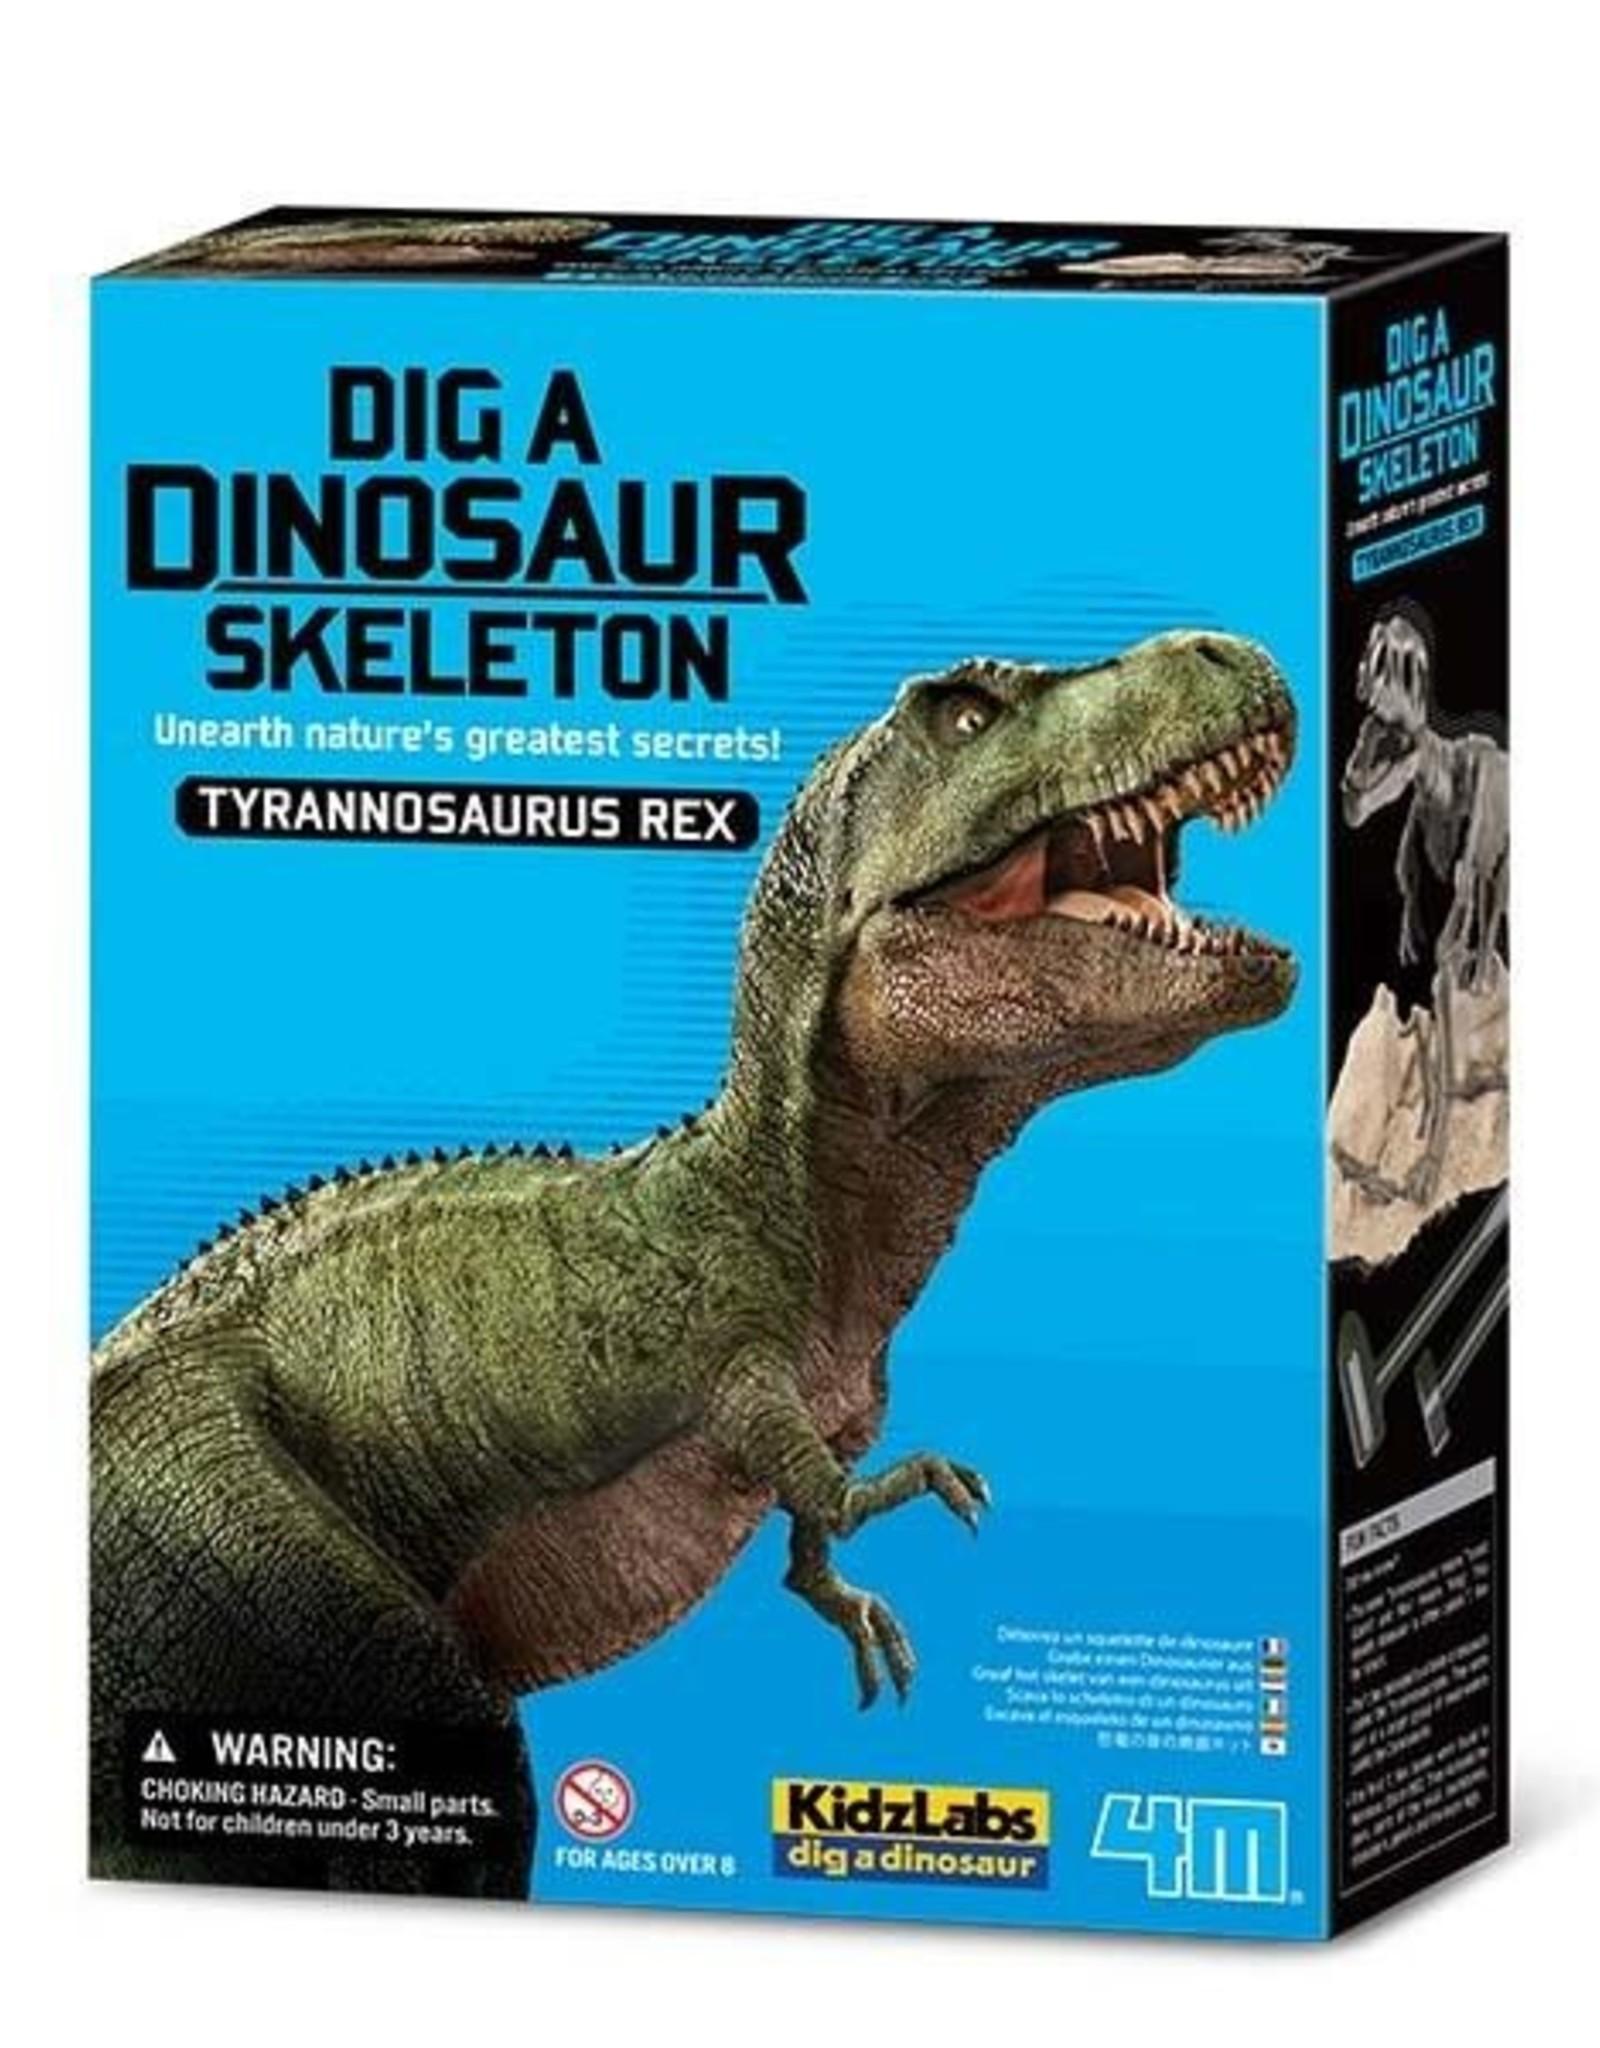 4M 4M Kidzlabs - Dig A Dinosaur T-Rex